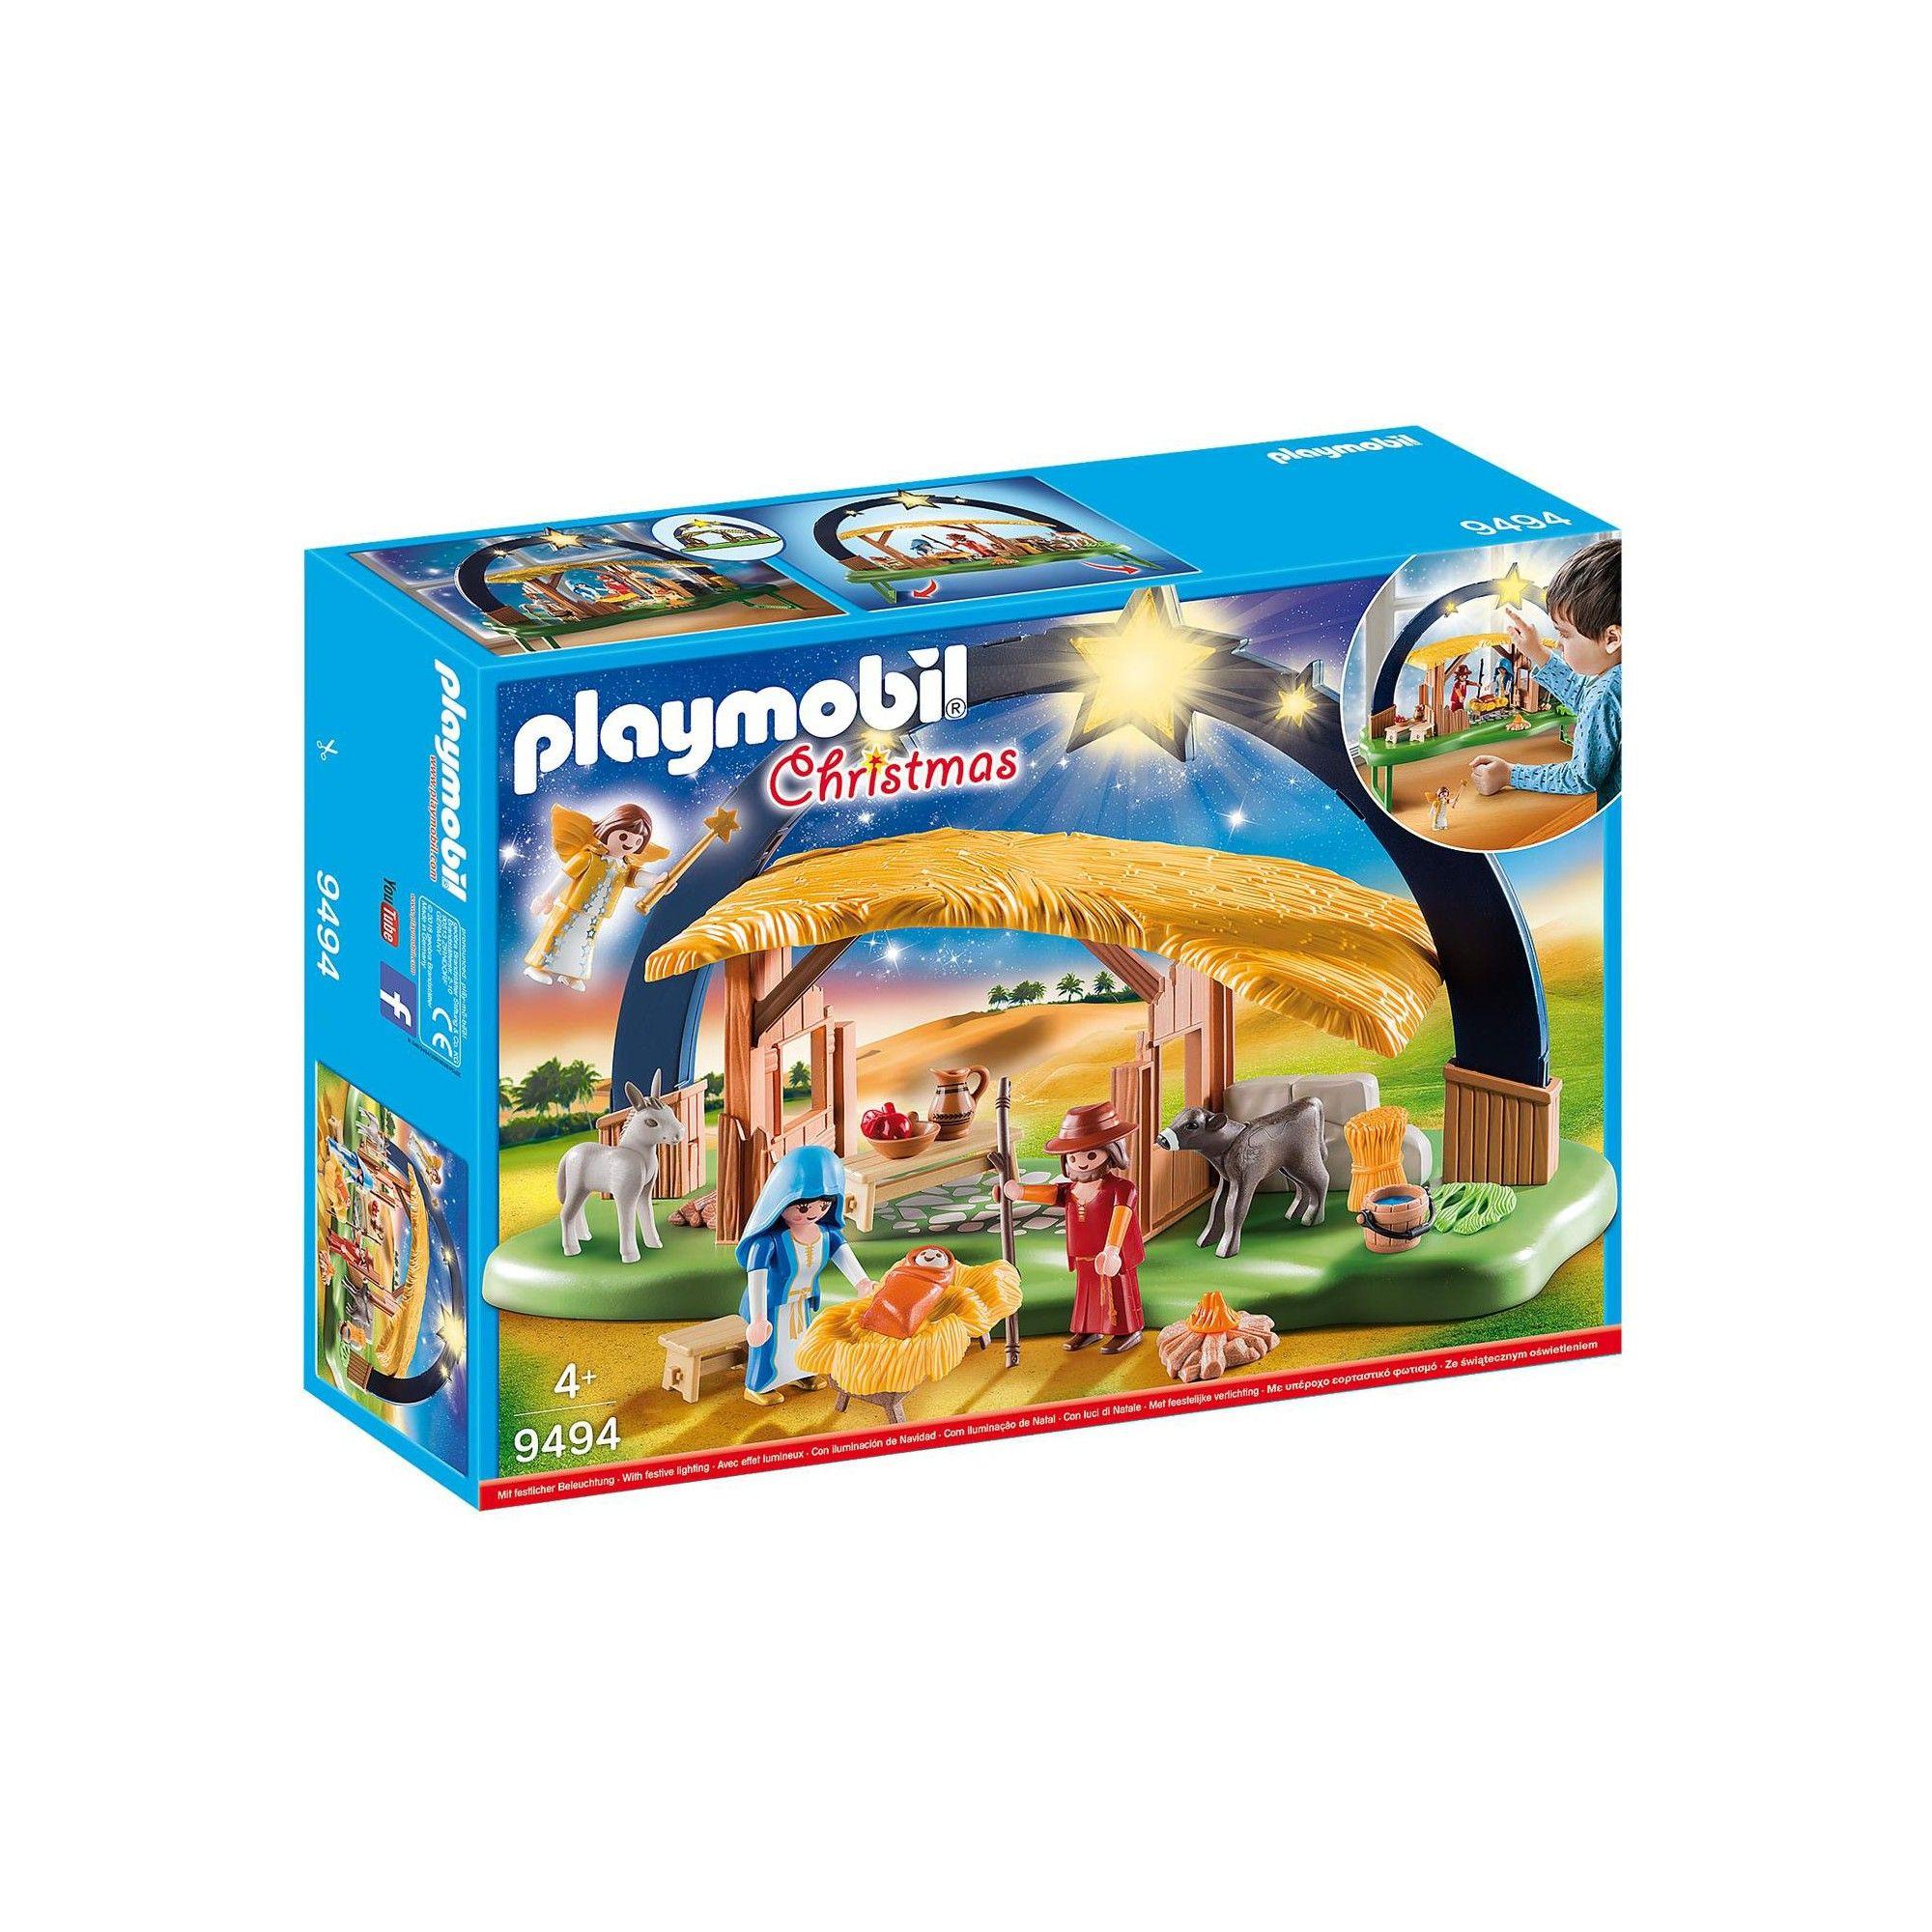 Playmobil Christmas Illuminating Nativity Manger Set 9494 Nativity Playmobil Christmas